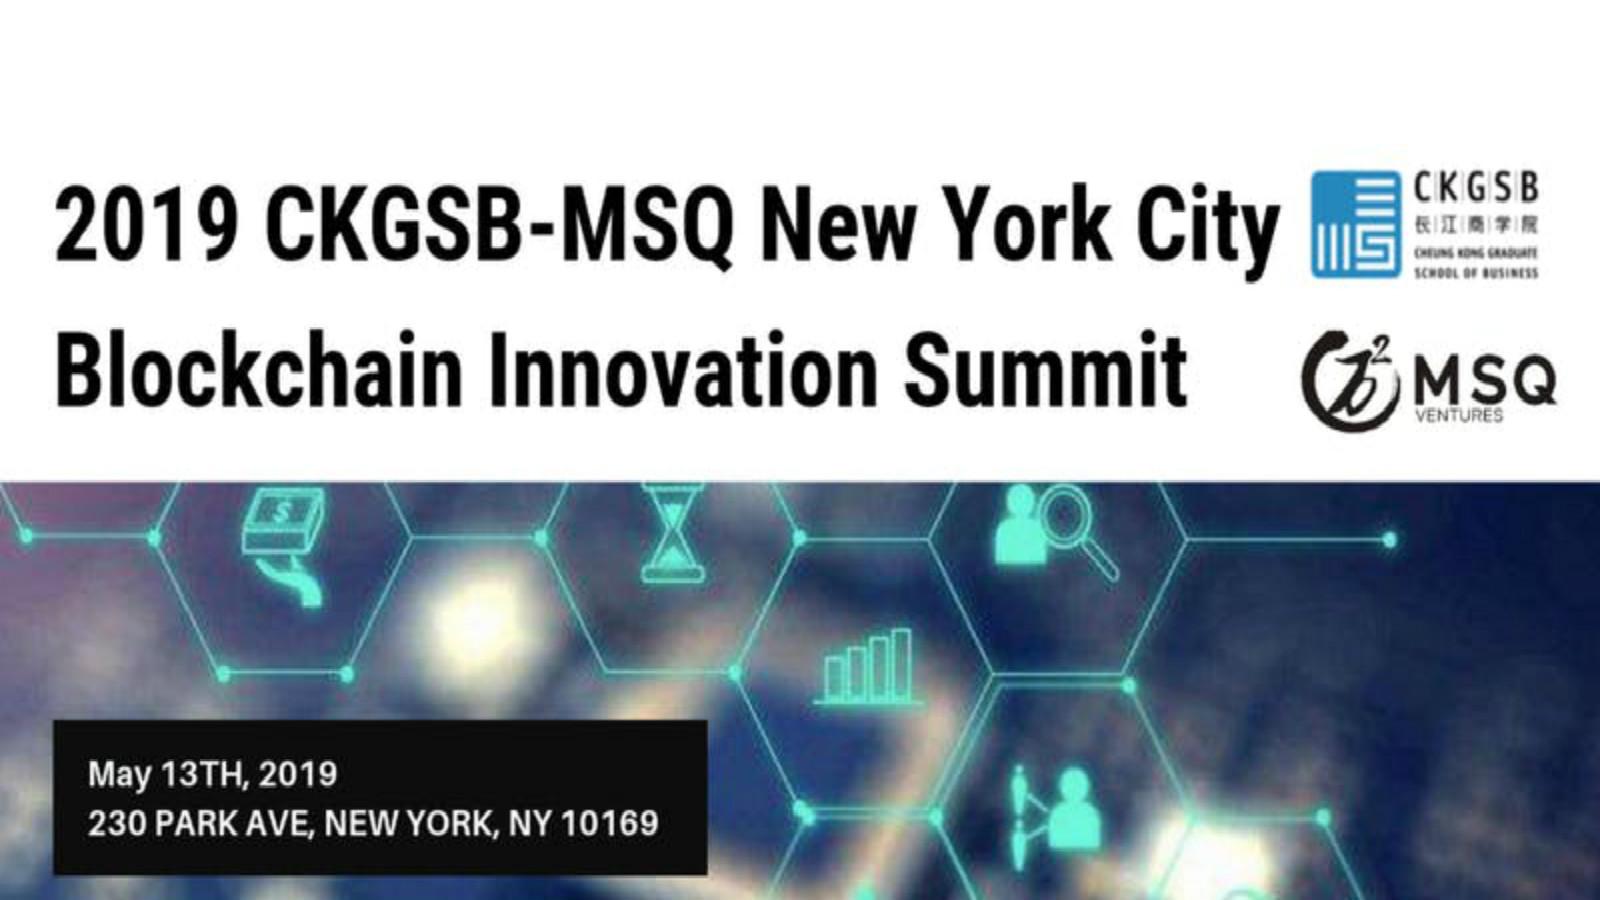 2019 CKGSB-MSQ New York City Blockchain Innovation Summit.jpg